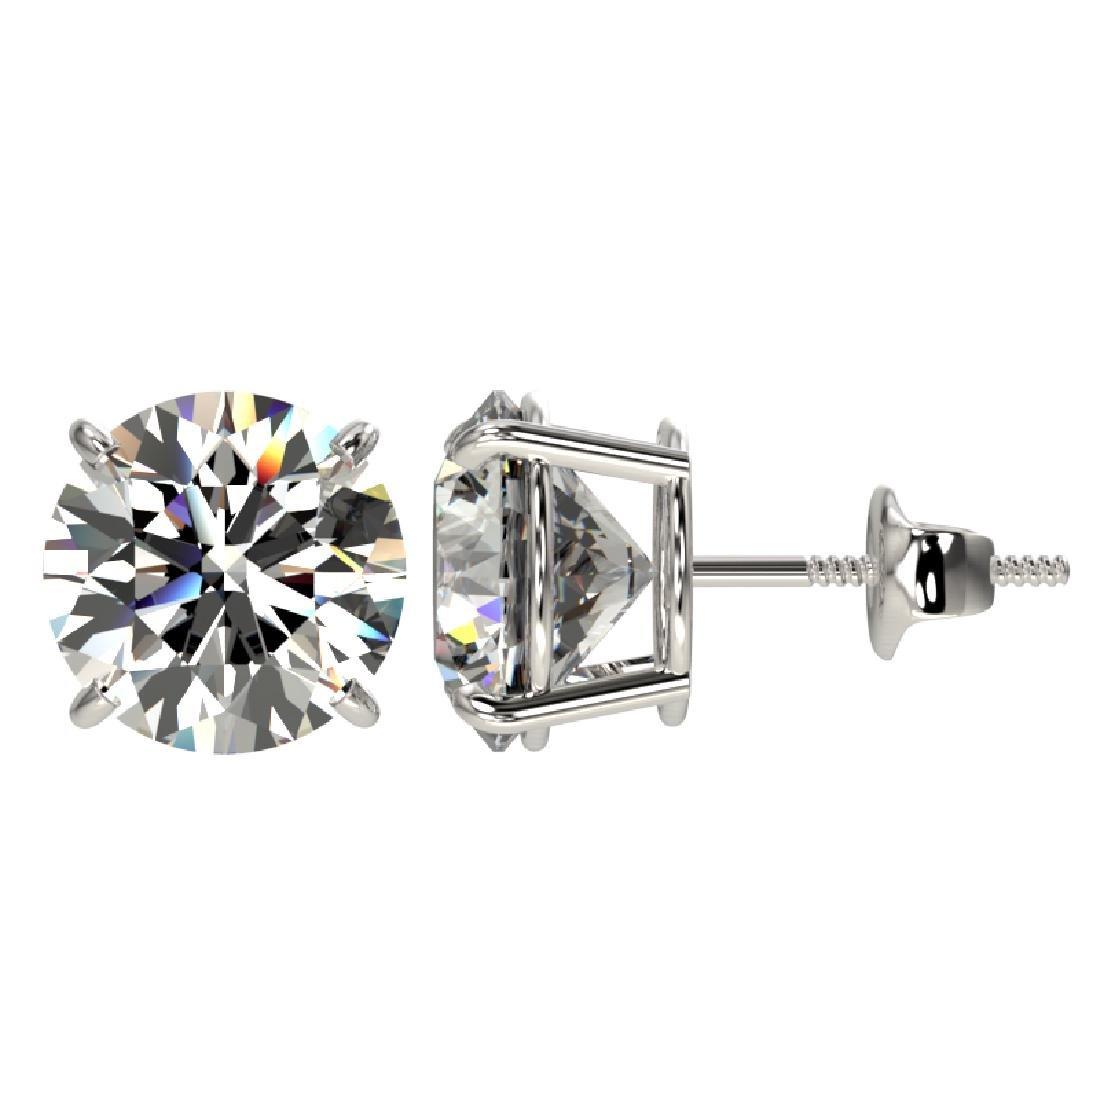 4.04 CTW Certified H-I Quality Diamond Stud Earrings - 2